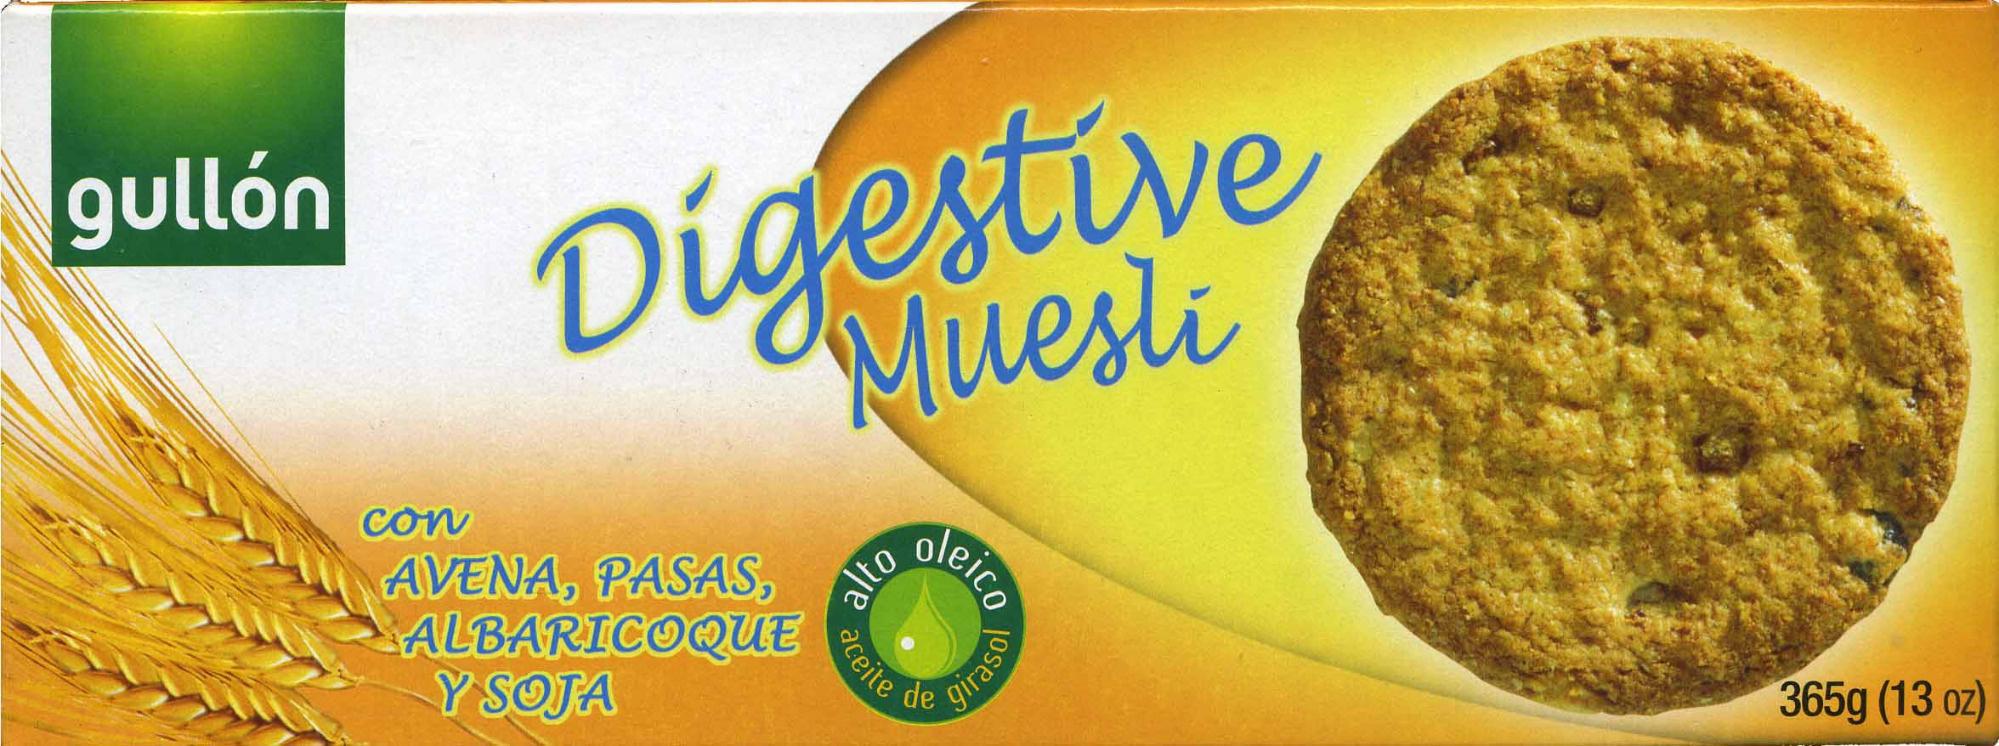 Digestive muesli - Producto - es